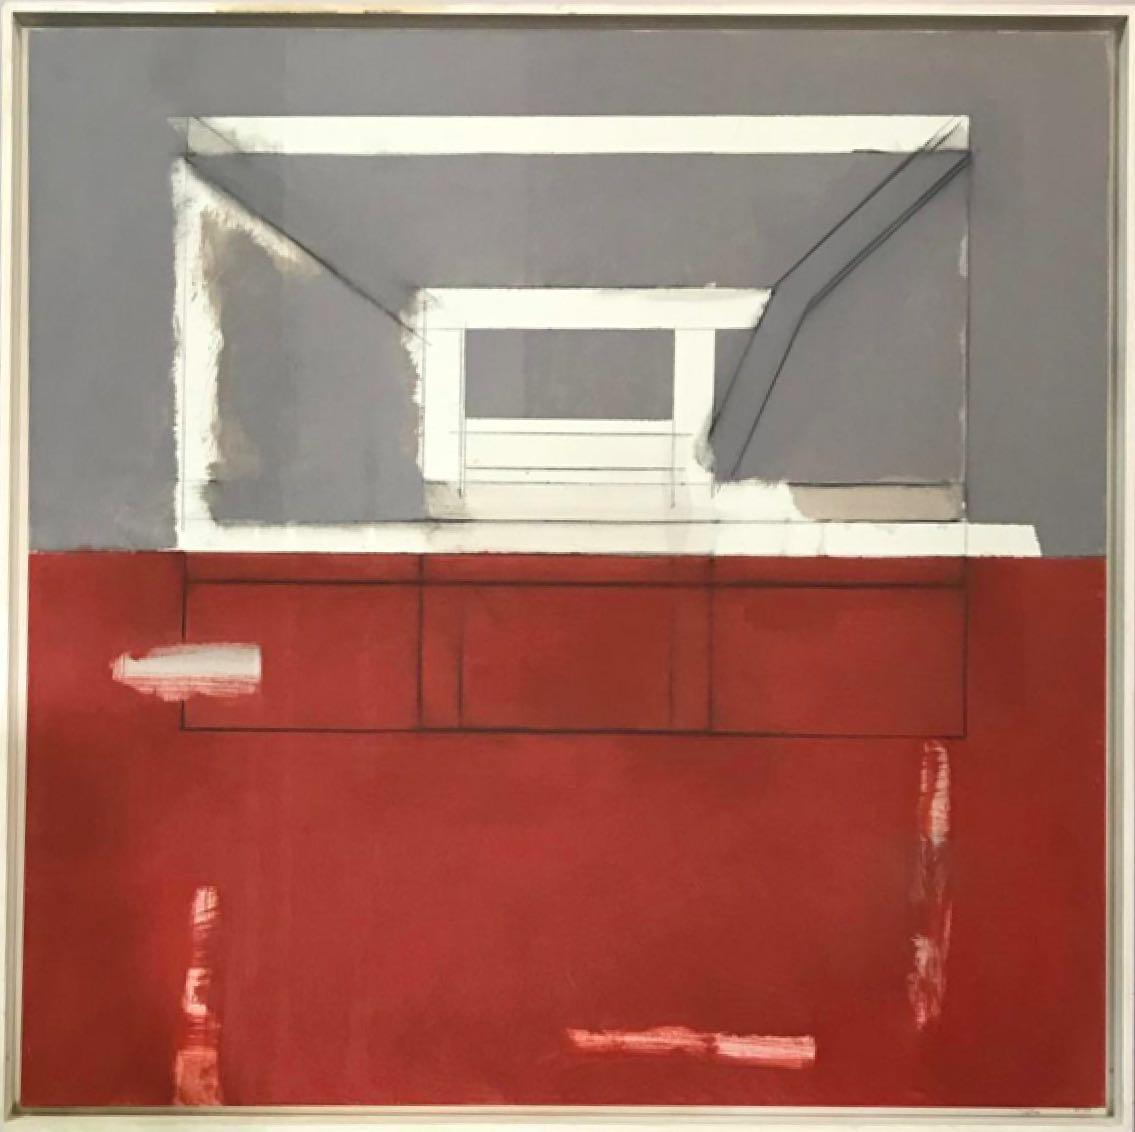 Antonio Freiles ARCHITECTURE, 2009 Oil and graphite on canvas. 100 x 100 cm (39 x 39 in)